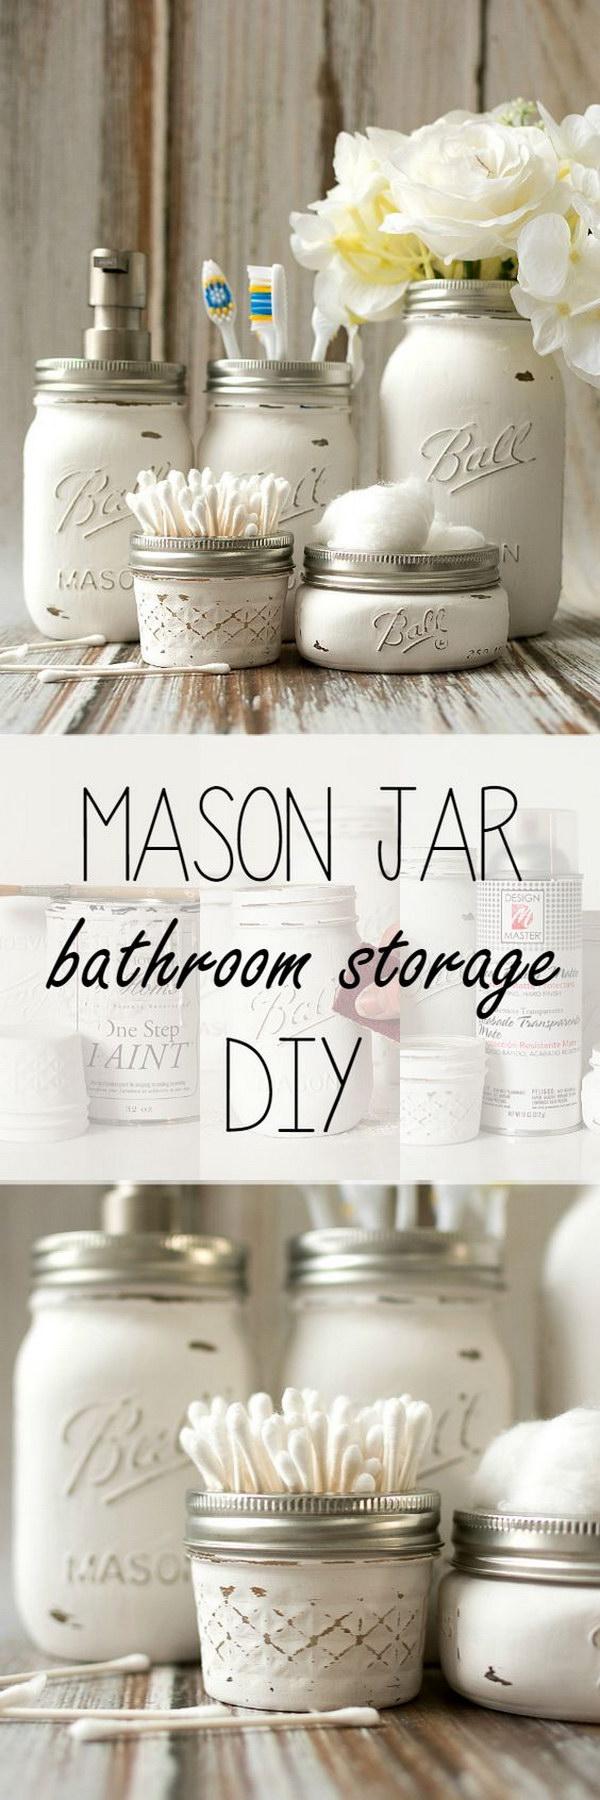 Mason Jar Bathroom Storage & Accessories